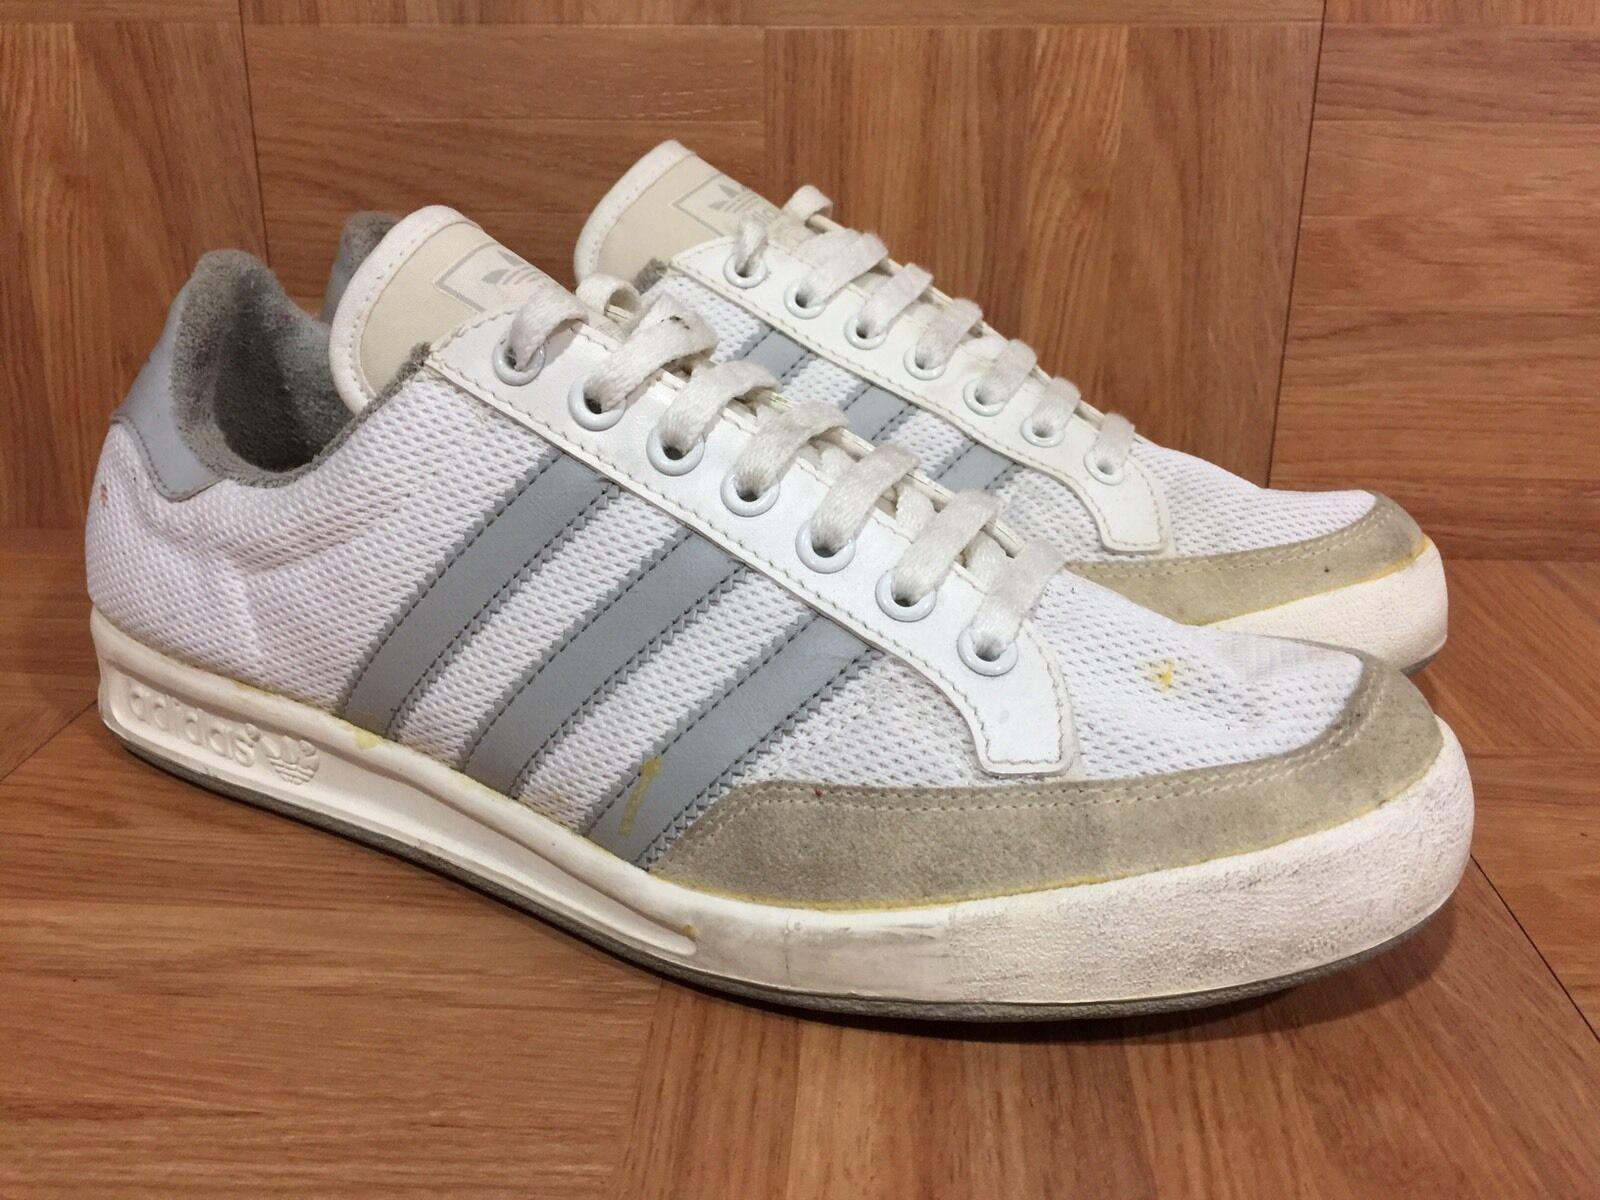 Vintage Adidas Athletic Shoes Men's Size 10 Court Lendl Lendl Lendl Edberg 80's Stan Smith f82f97